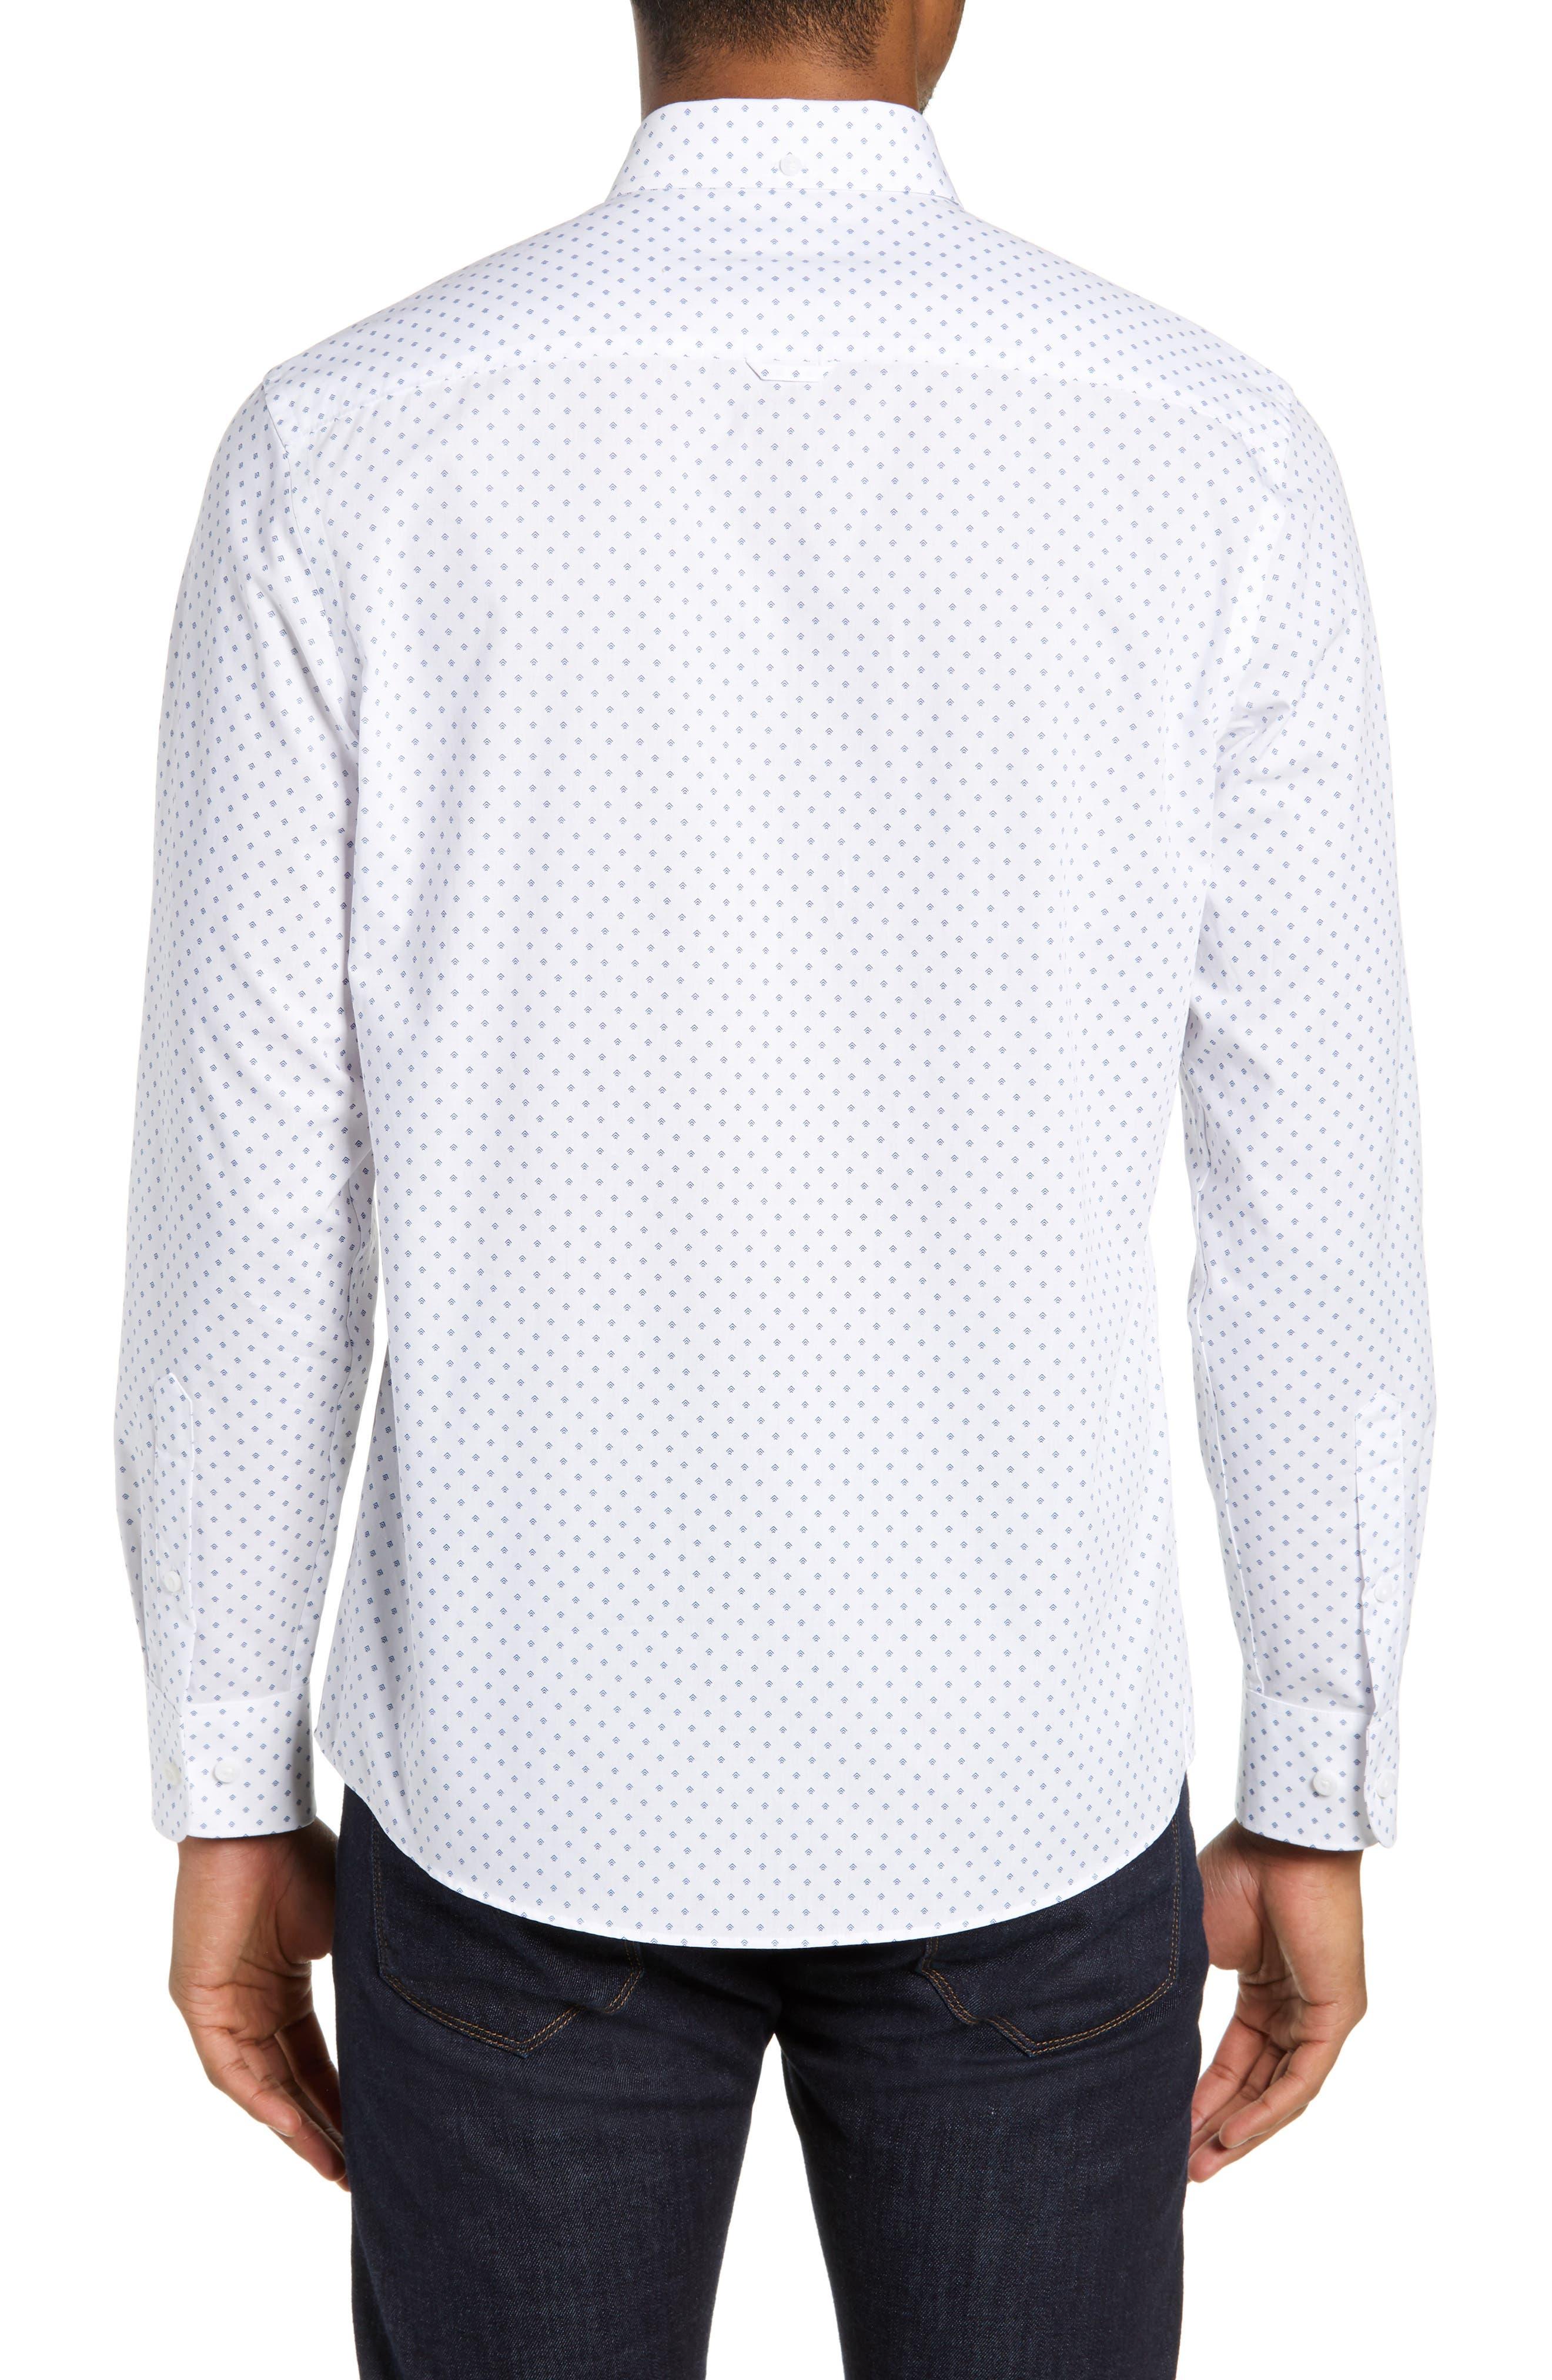 NORDSTROM MEN'S SHOP,                             Slim Fit Non-Iron Geo Print Sport Shirt,                             Alternate thumbnail 3, color,                             100